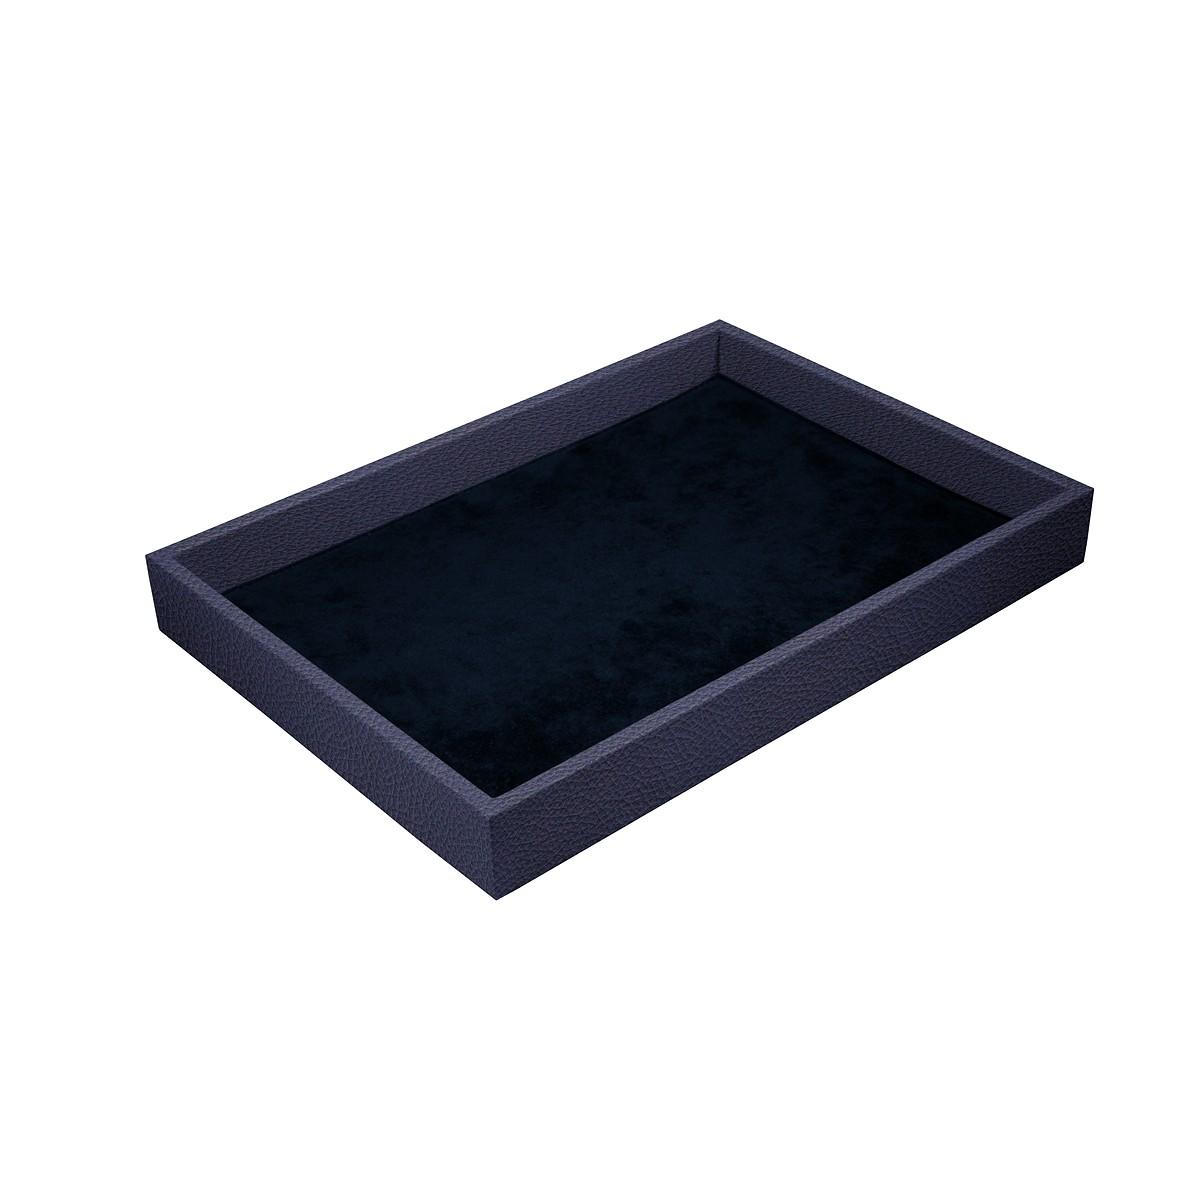 Presentation tray 12.2 x 8.9 inches